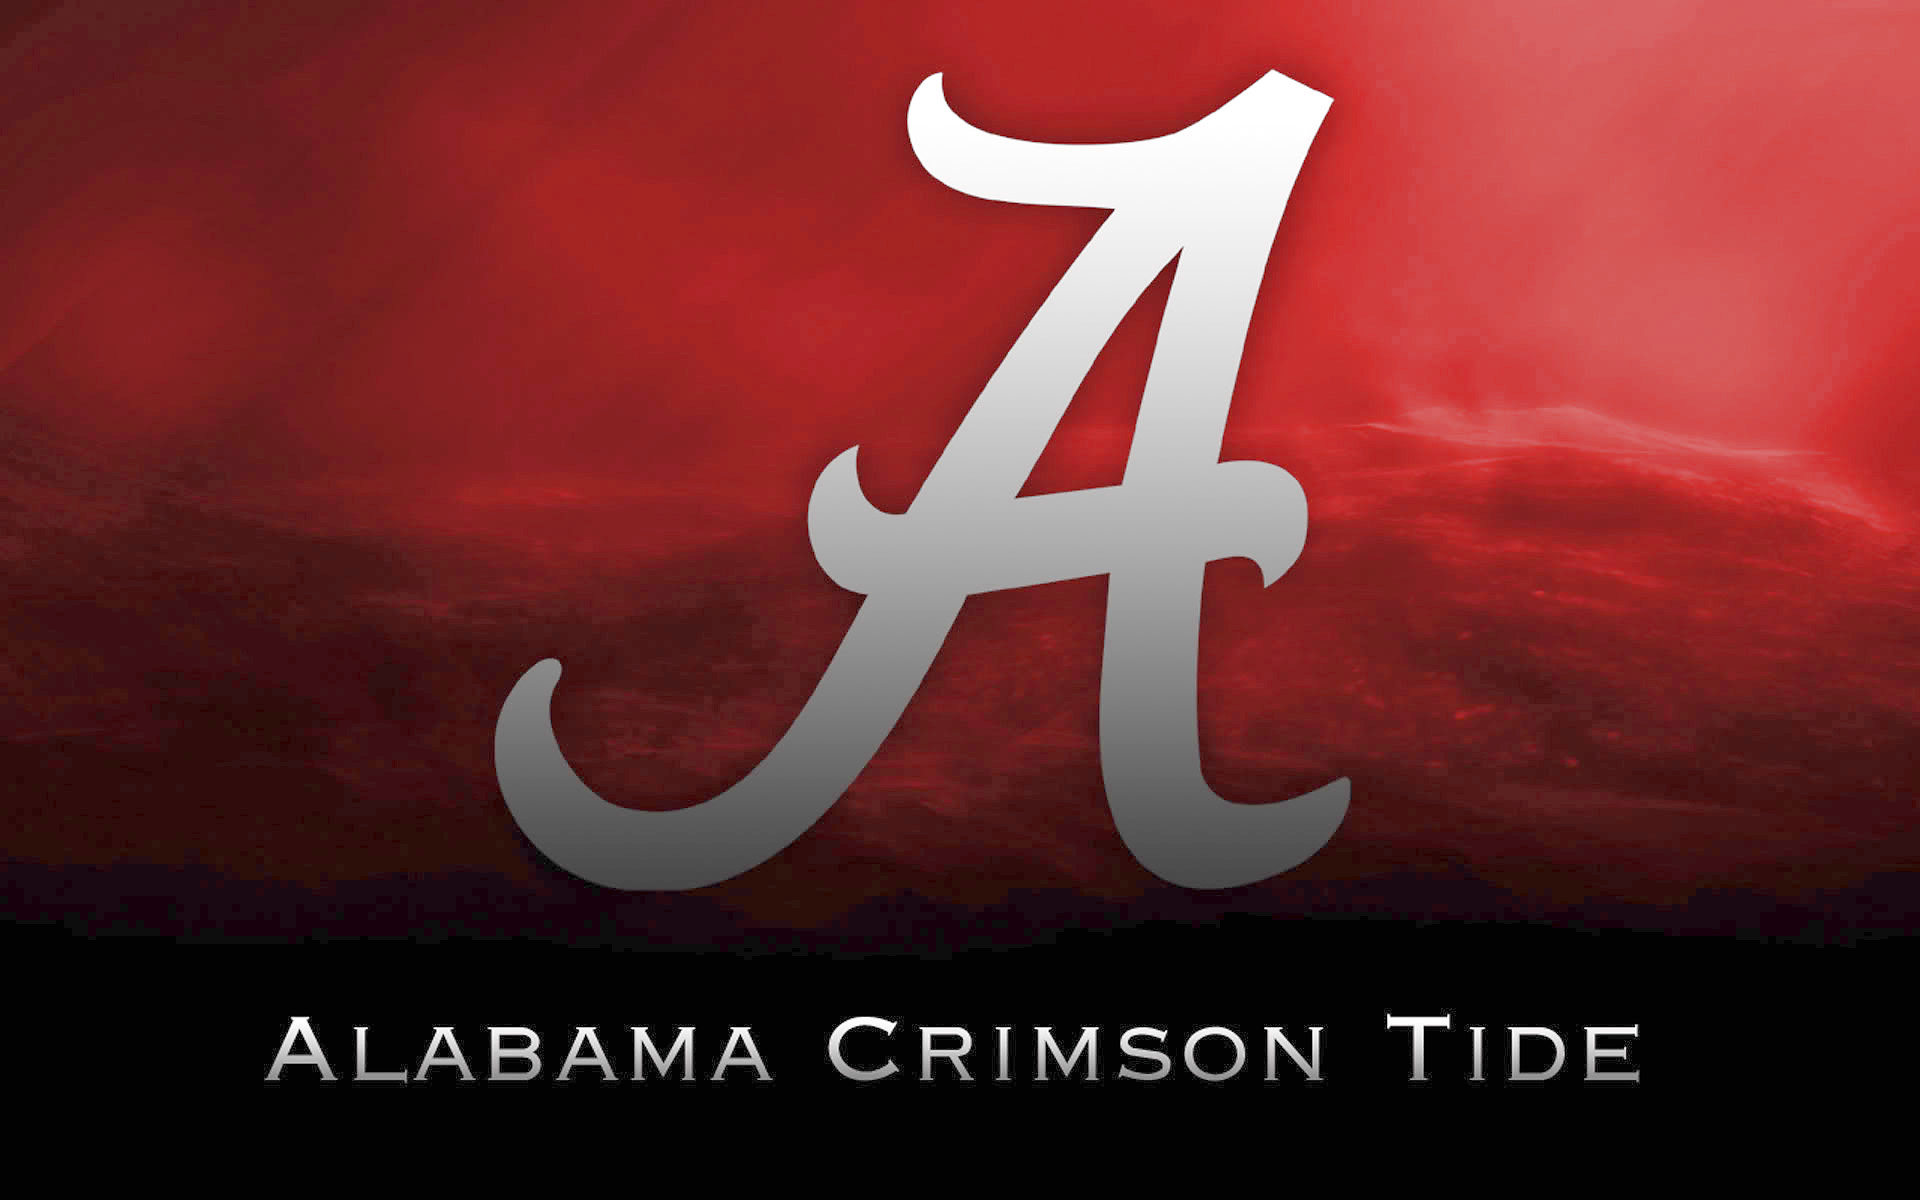 Alabama Crimson Tide Iphone Wallpaper Free Alabama Crimson Tide Wallpapers Pixelstalk Net